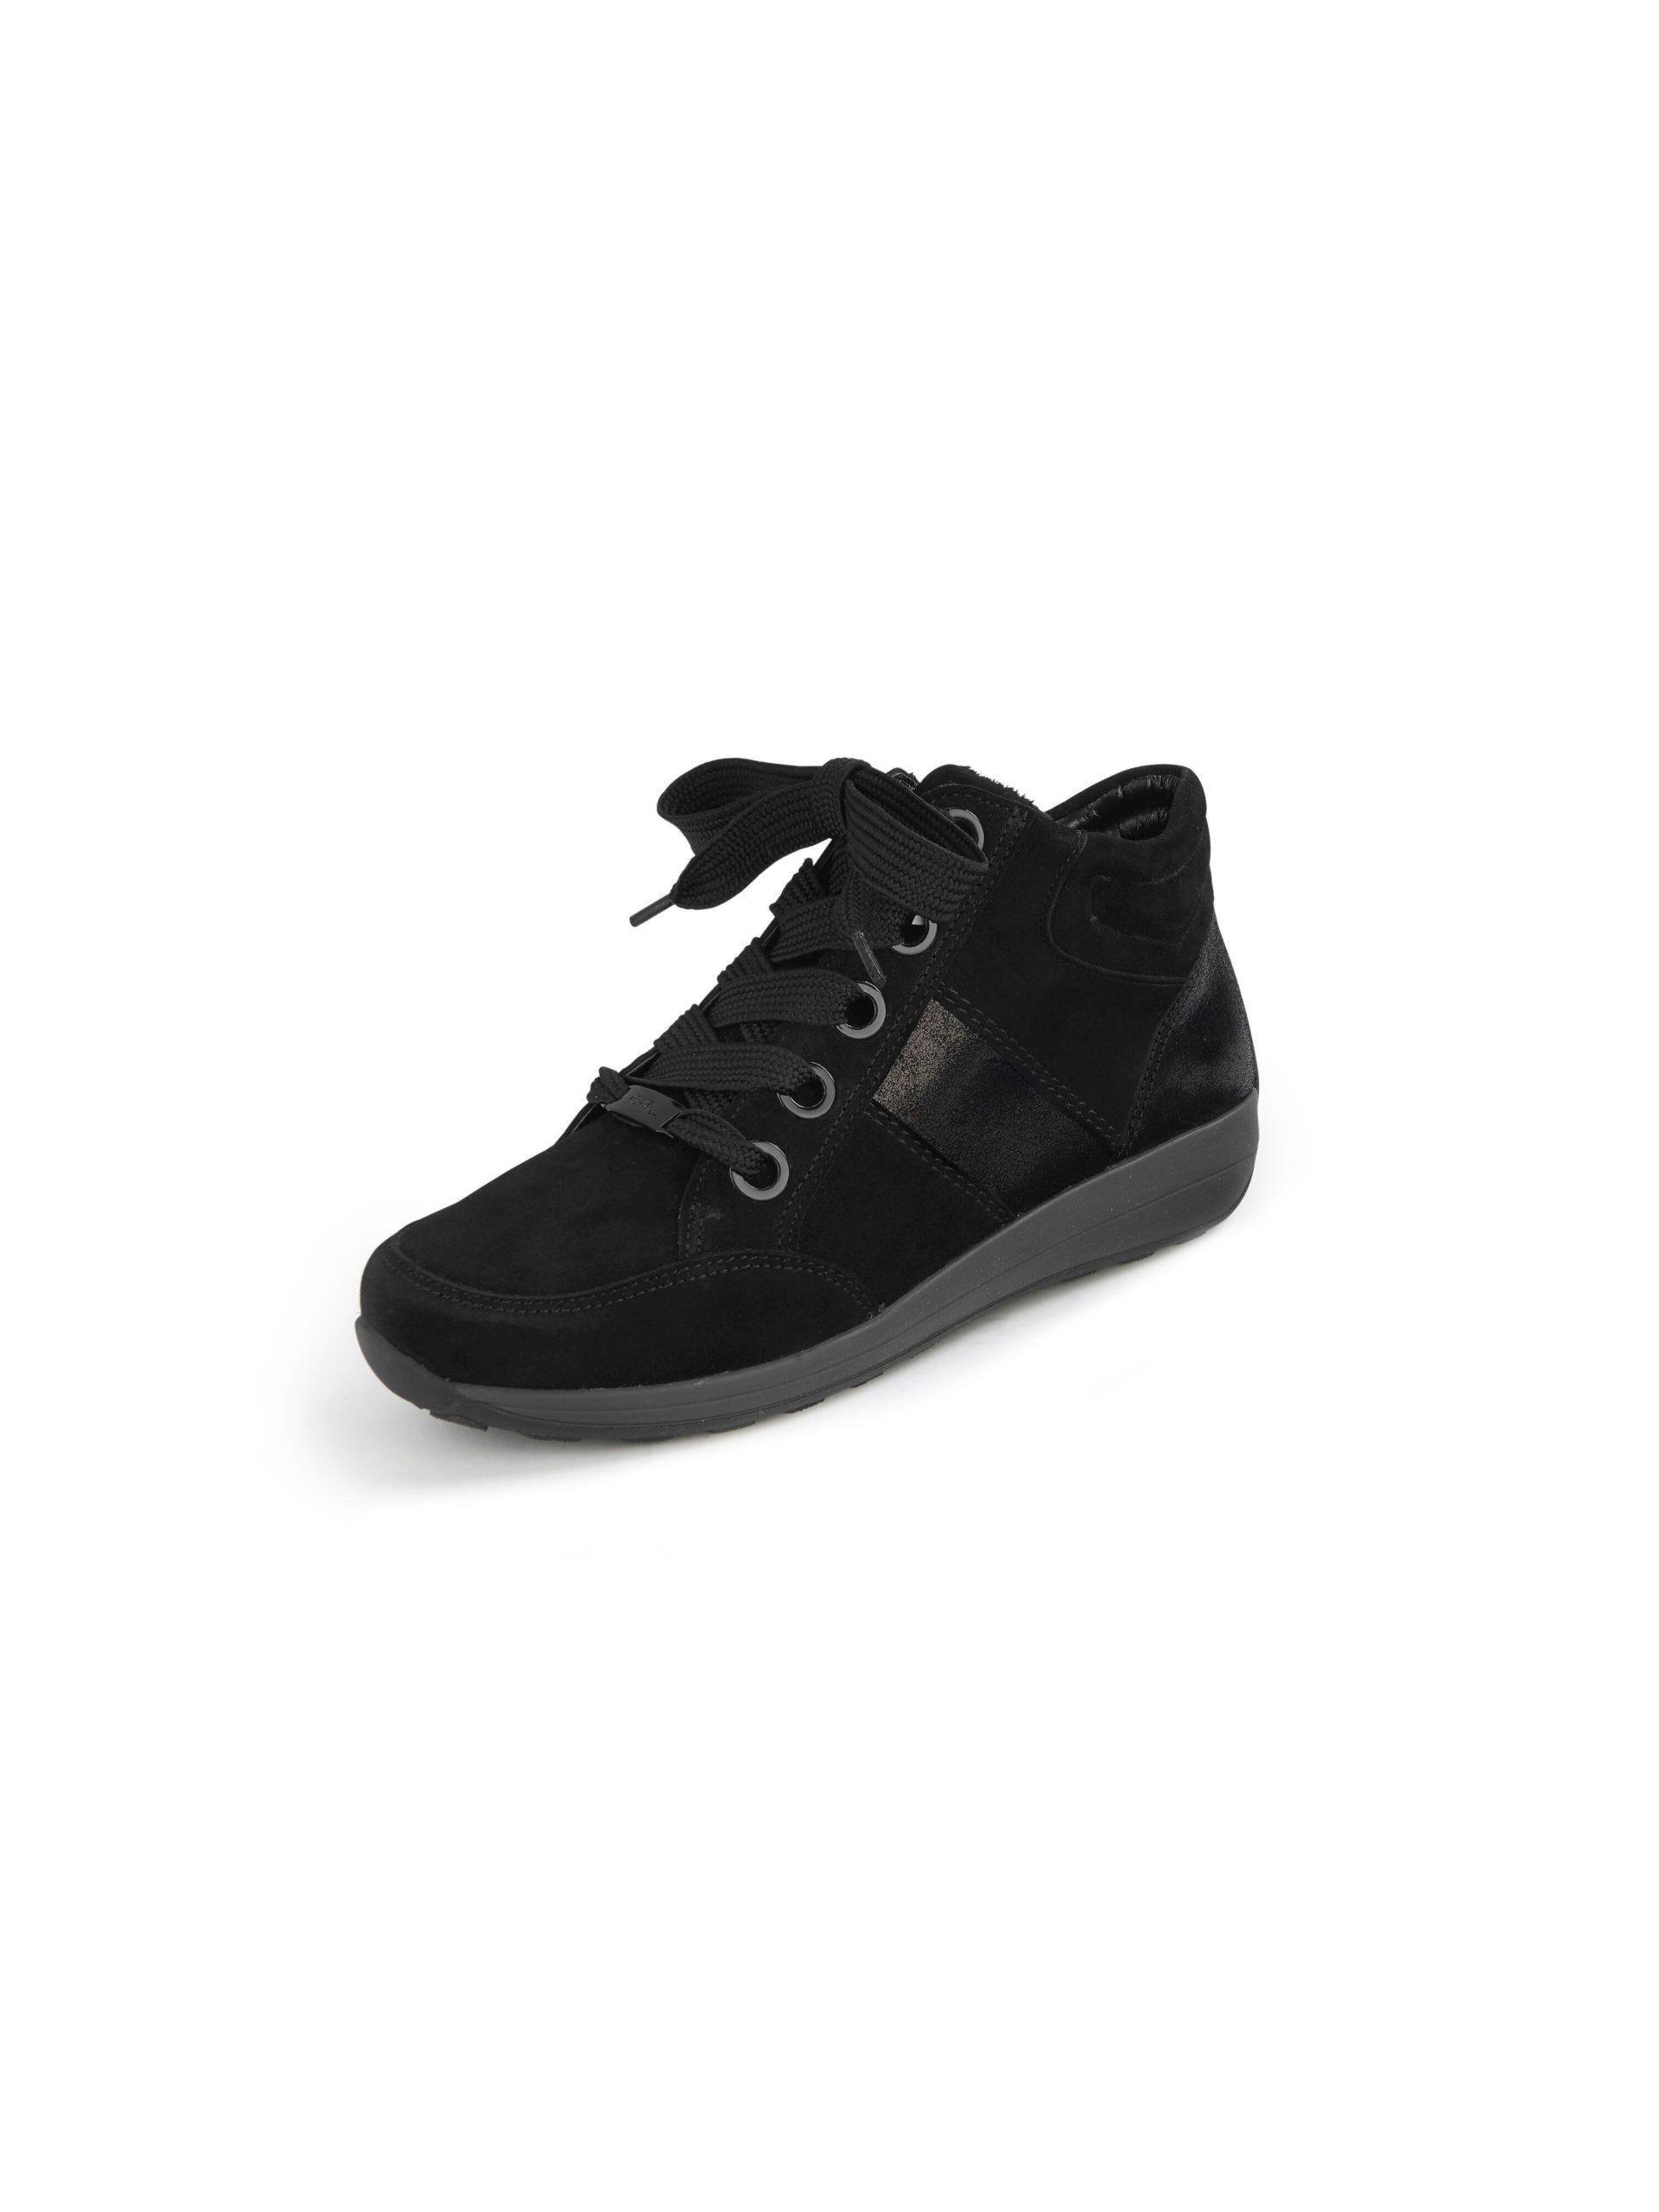 Enkelhoge schoenen model Osaka HighSoft' Van ARA zwart Kopen